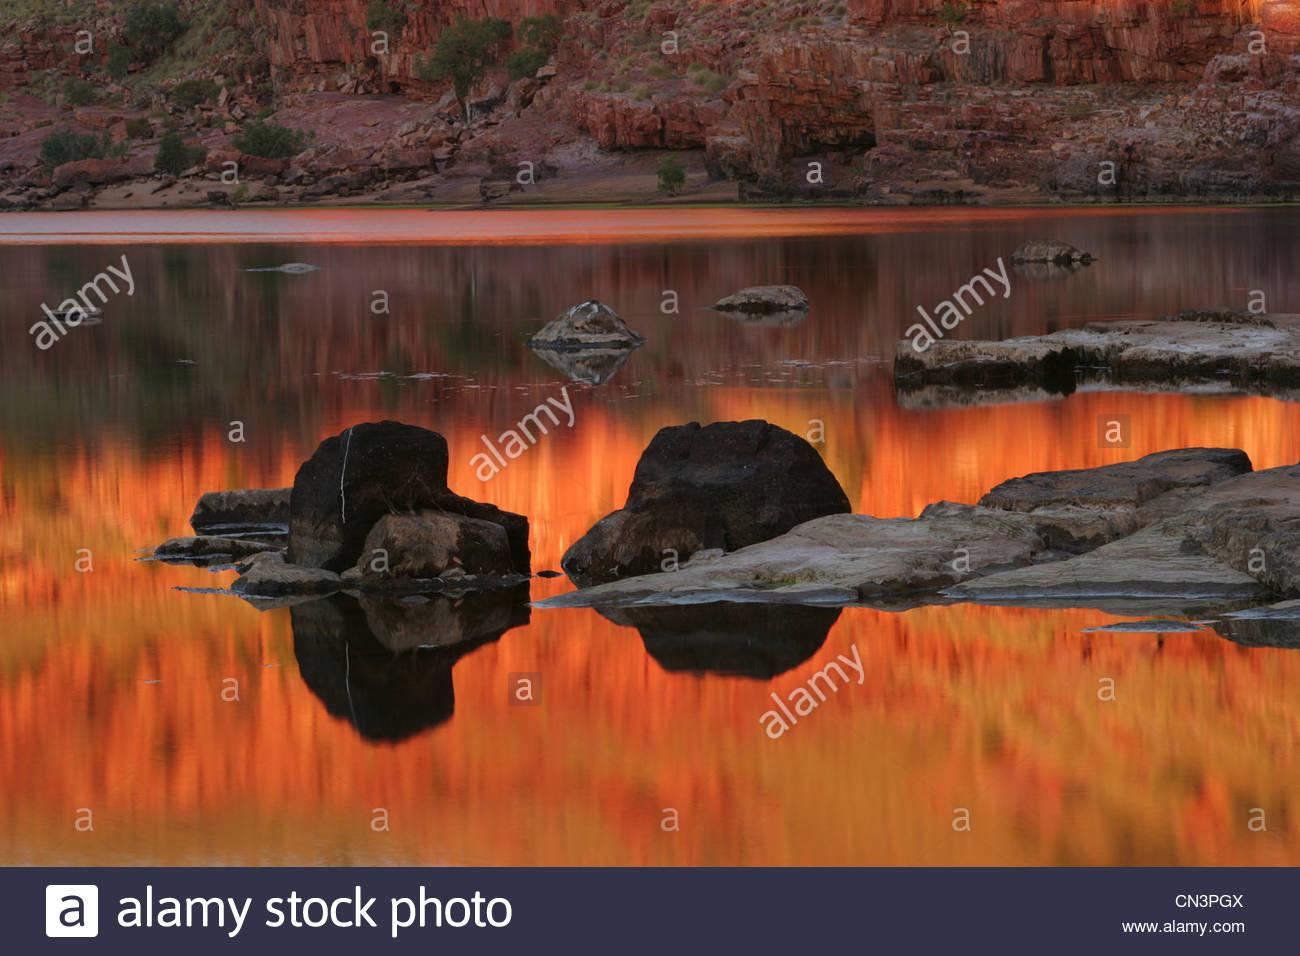 Dimond Schlucht, Mornington Sanctuary, Kimberley-Region in Western Australia Stockbild